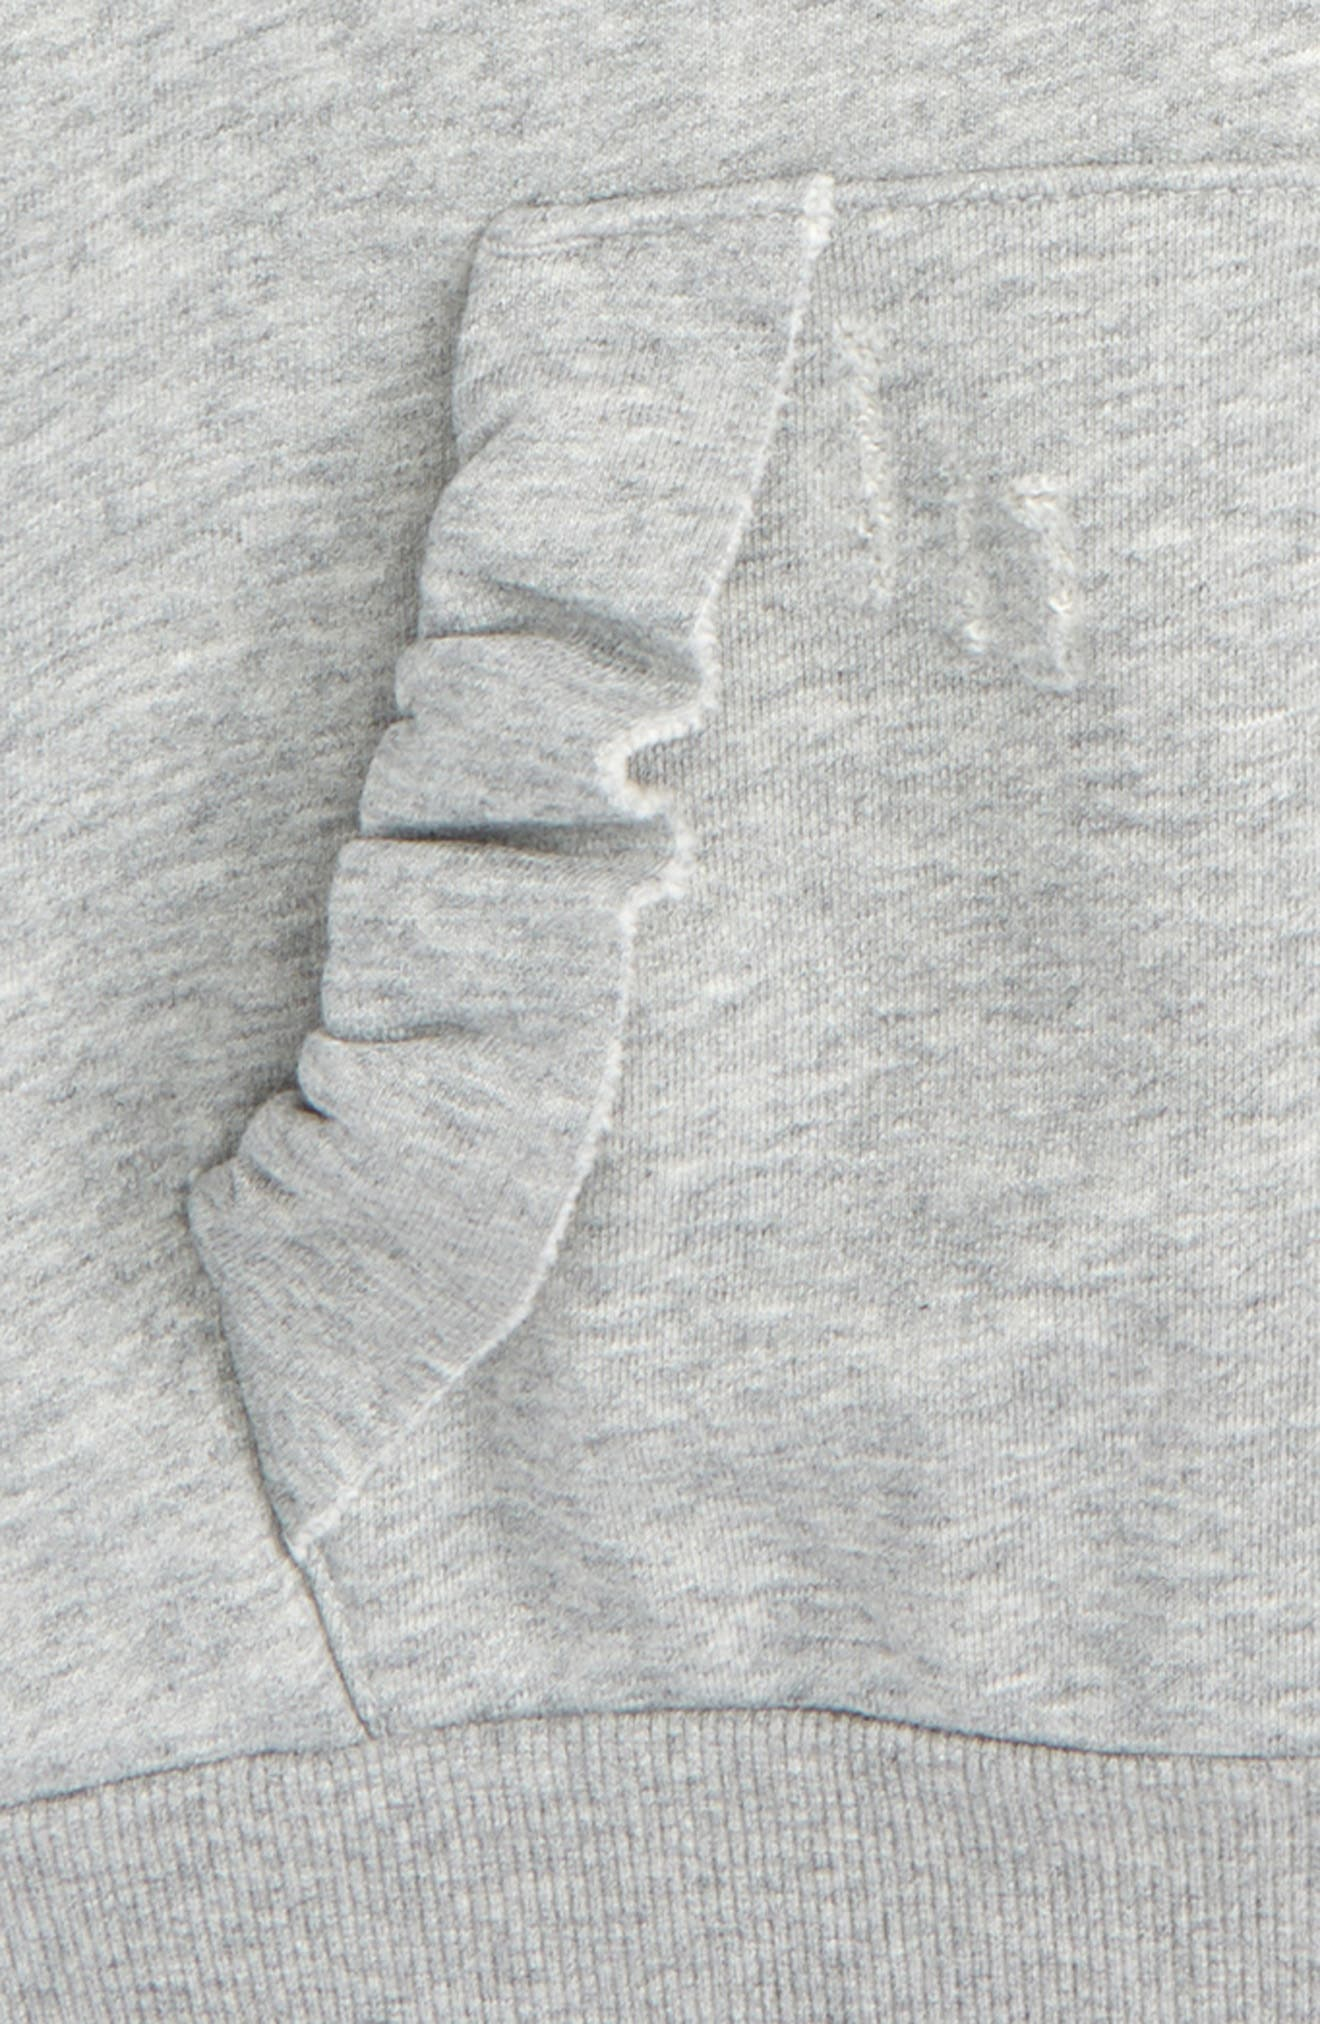 Ruffle Sleeve Hoodie,                             Alternate thumbnail 2, color,                             020